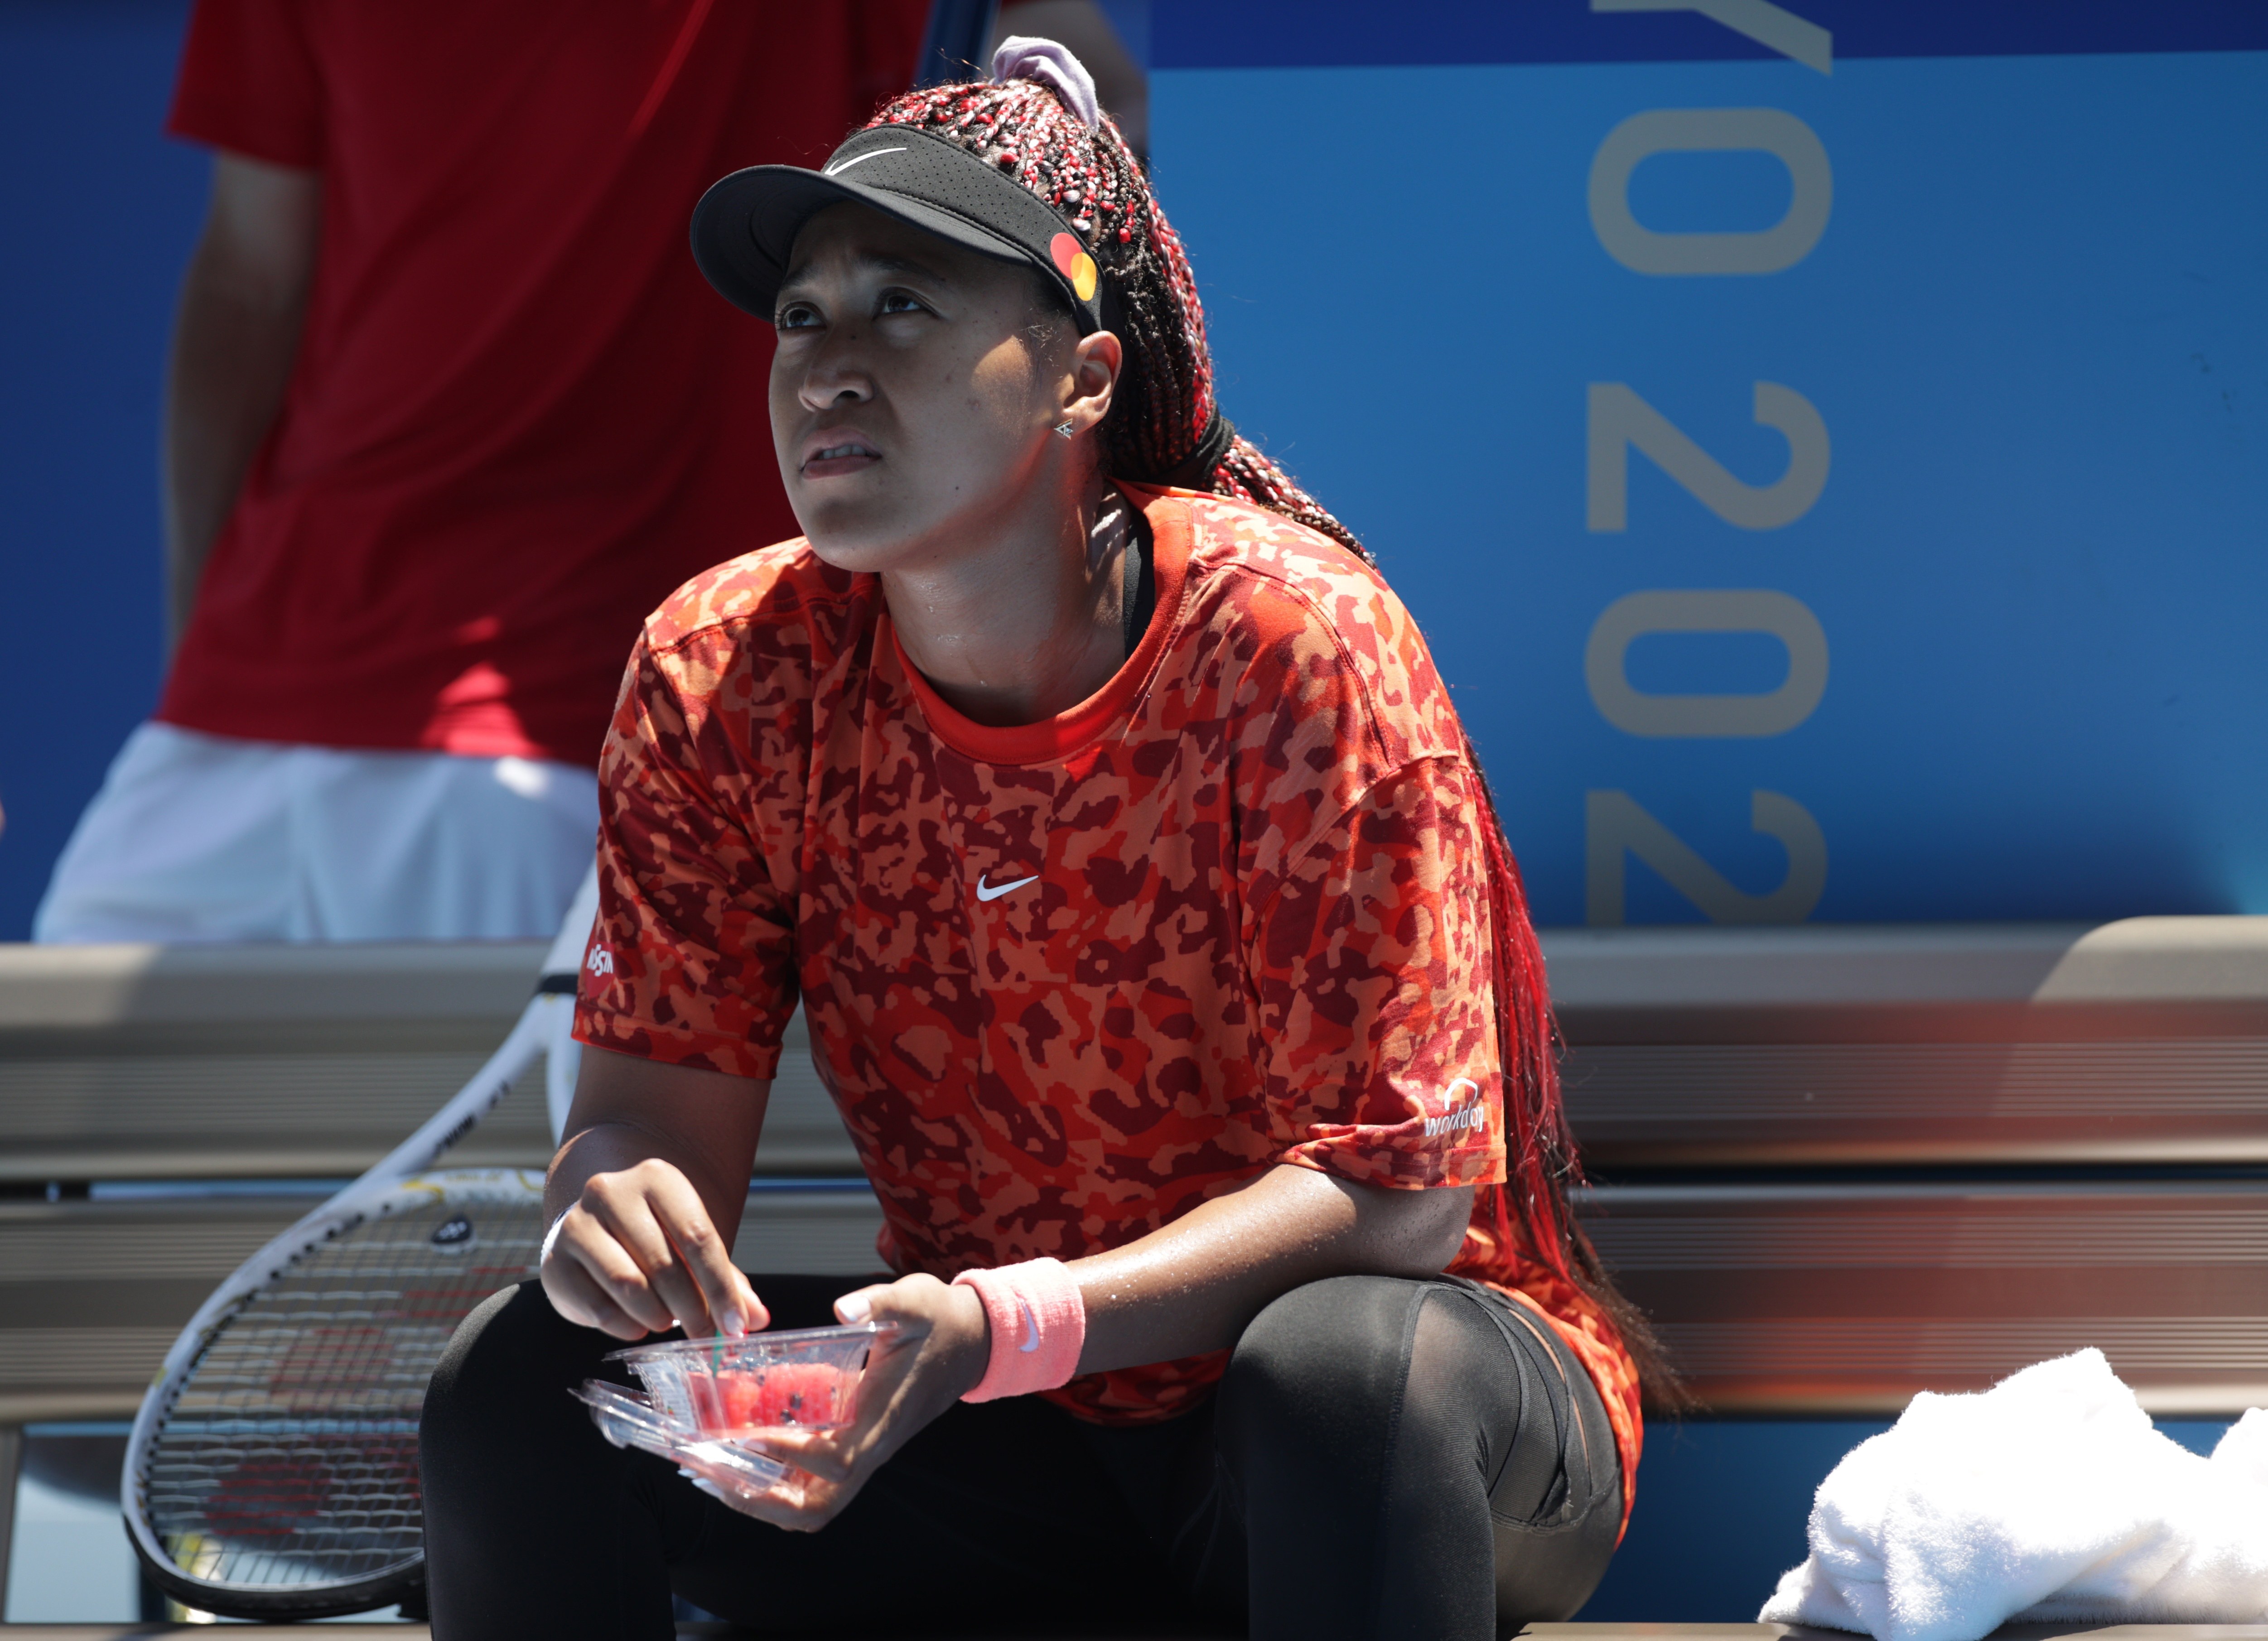 Tokyo 2020 Olympics - Tennis Training - Ariake Tennis Park, Tokyo, Japan - July 19, 2021 Naomi Osaka of Japan during training REUTERS/Hannah Mckay